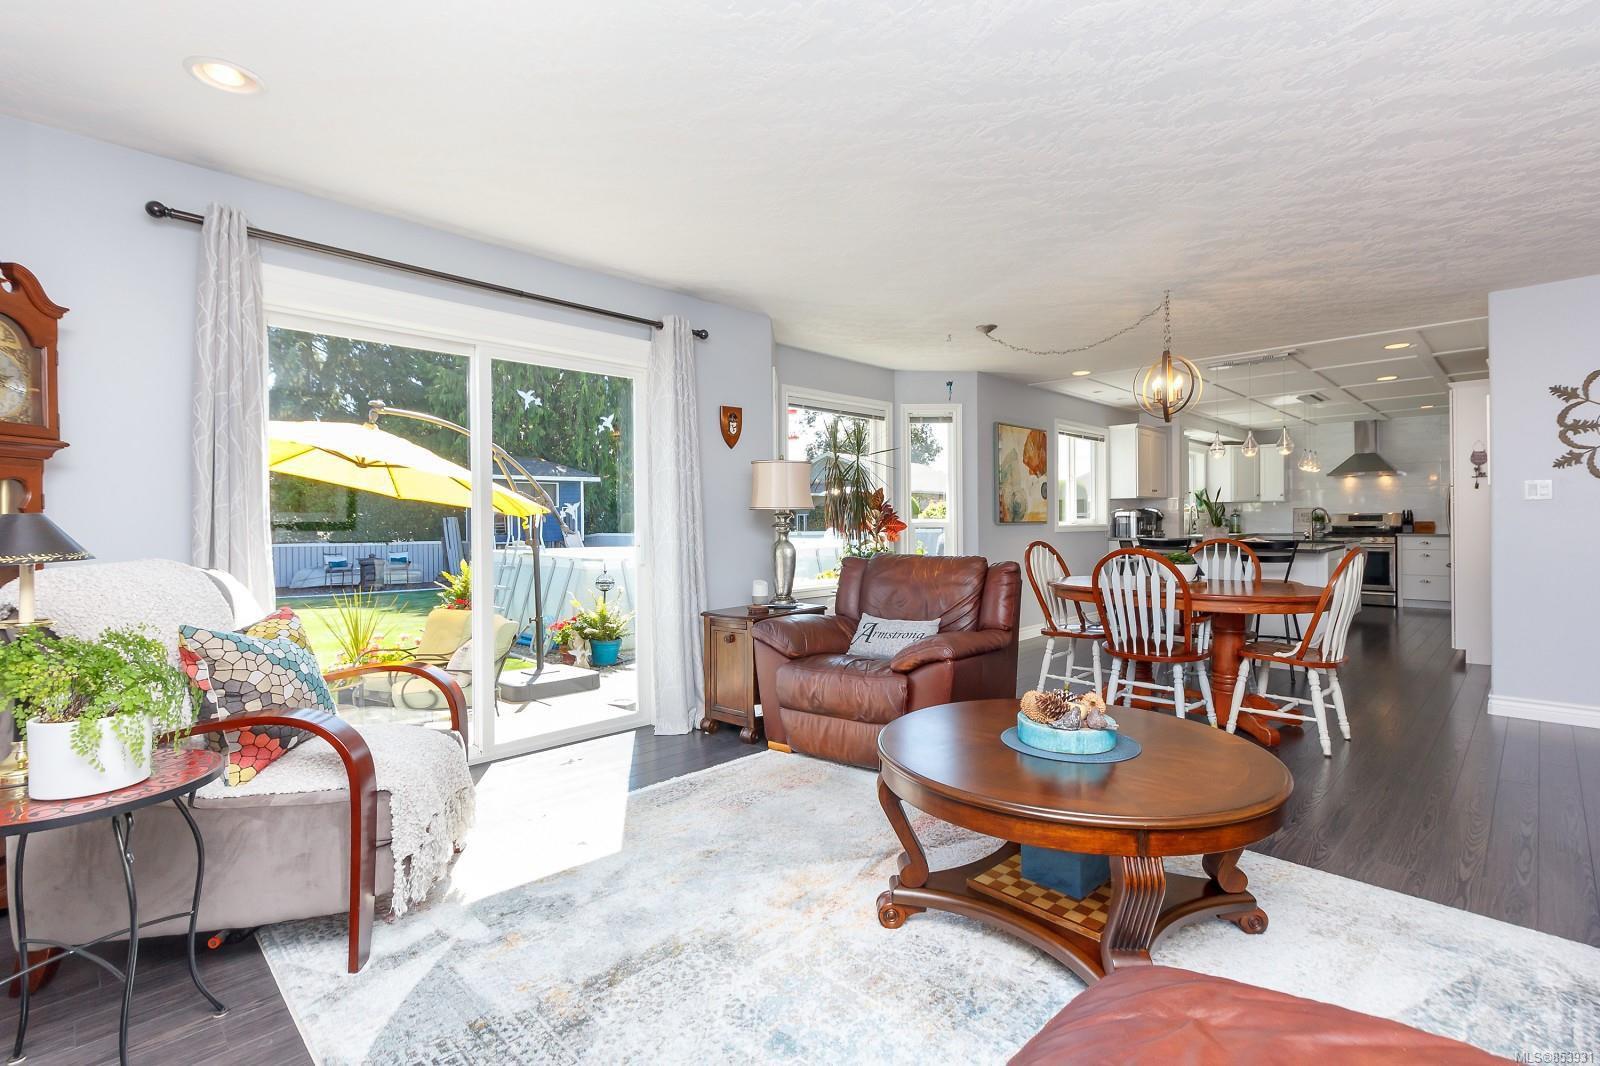 Photo 5: Photos: 2456 Timbercrest Dr in : Du East Duncan House for sale (Duncan)  : MLS®# 853931